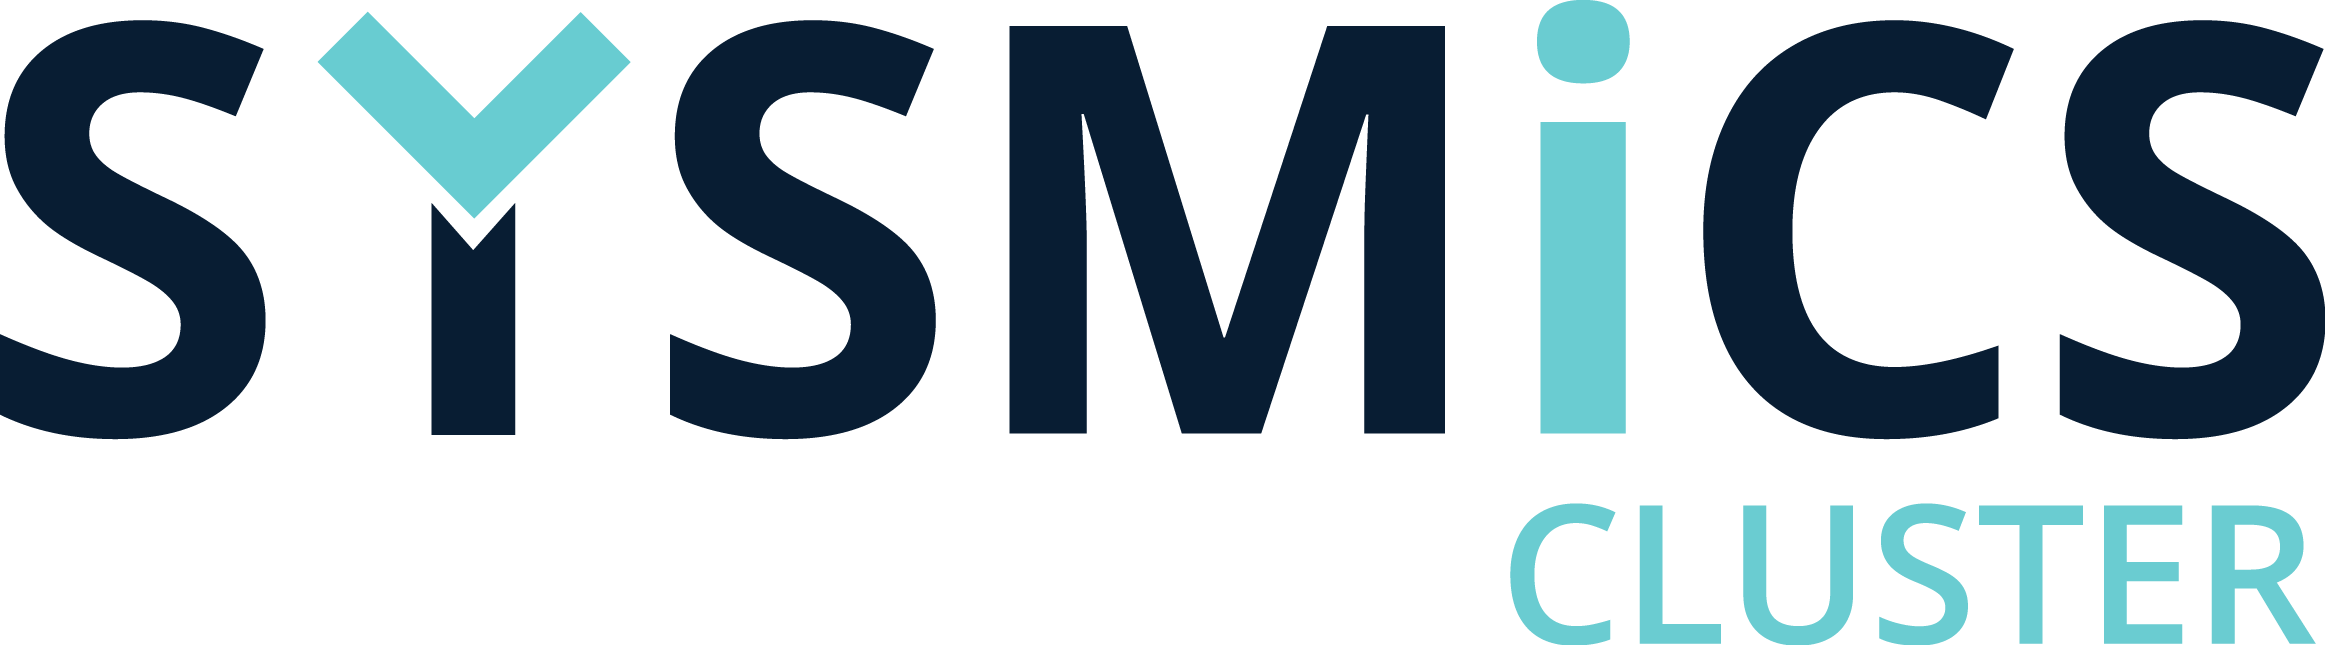 Sysmics cluster